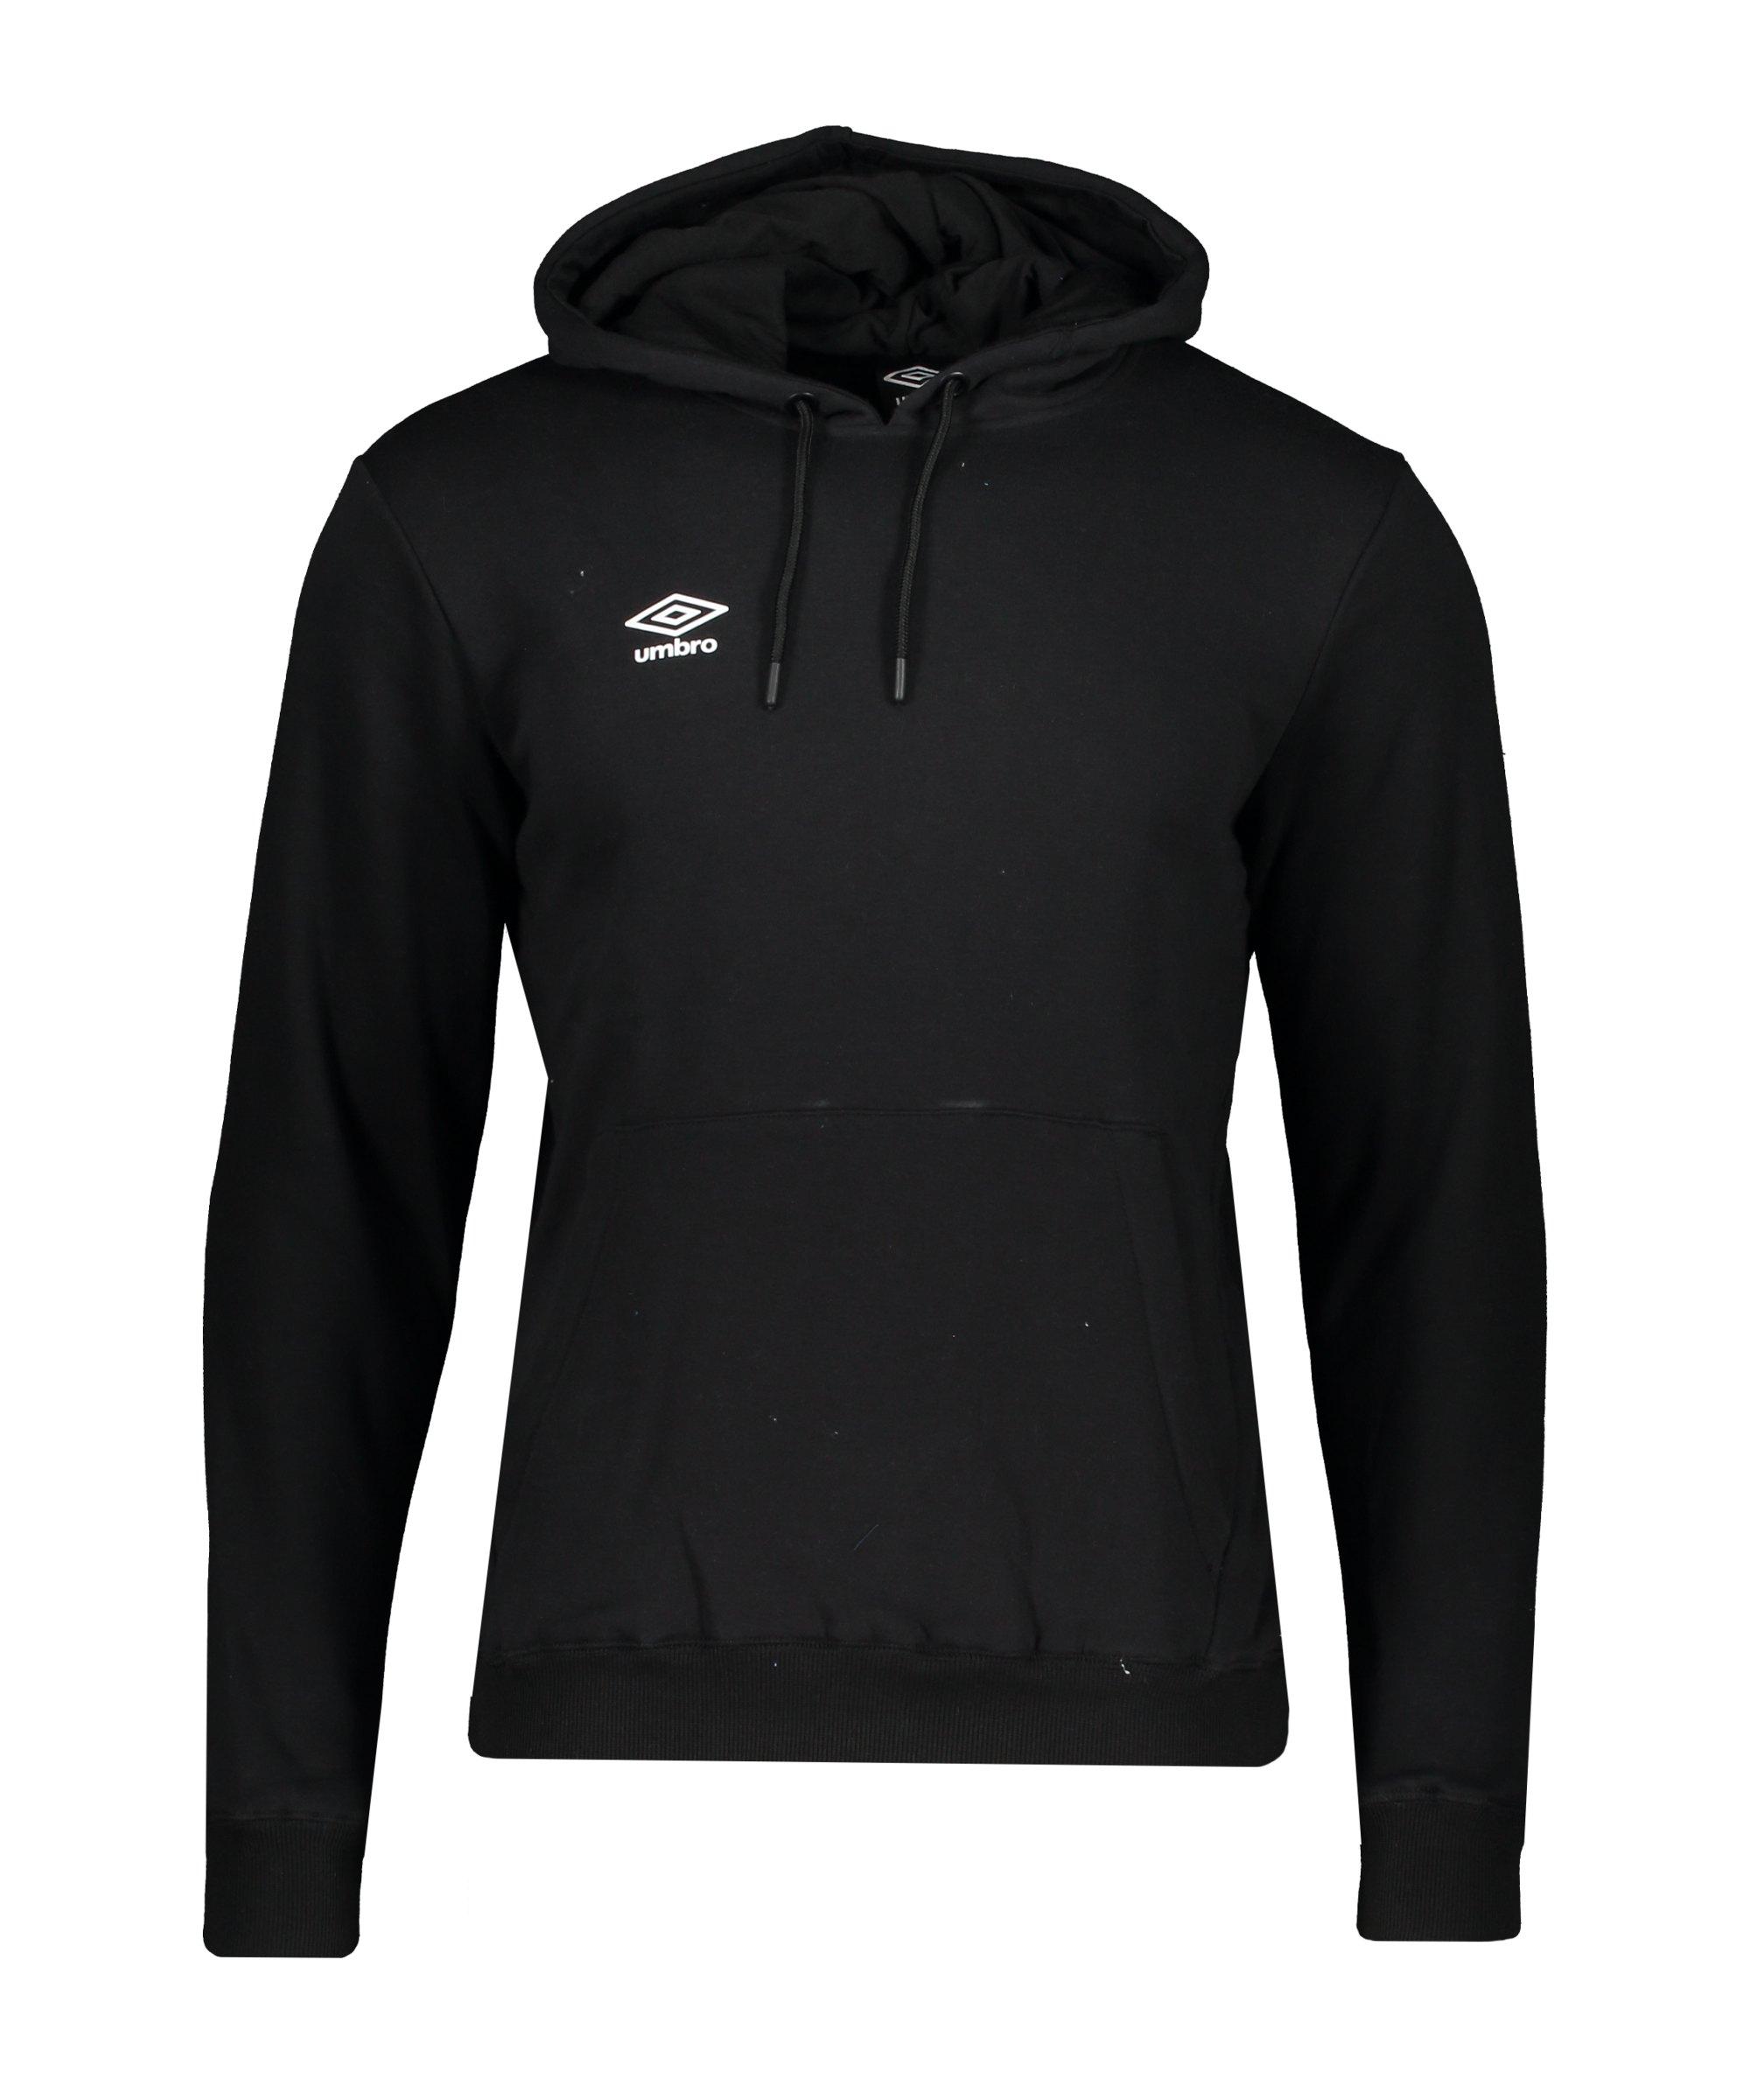 Umbro Club Leisure OH Kapuzensweatshirt F090 - schwarz